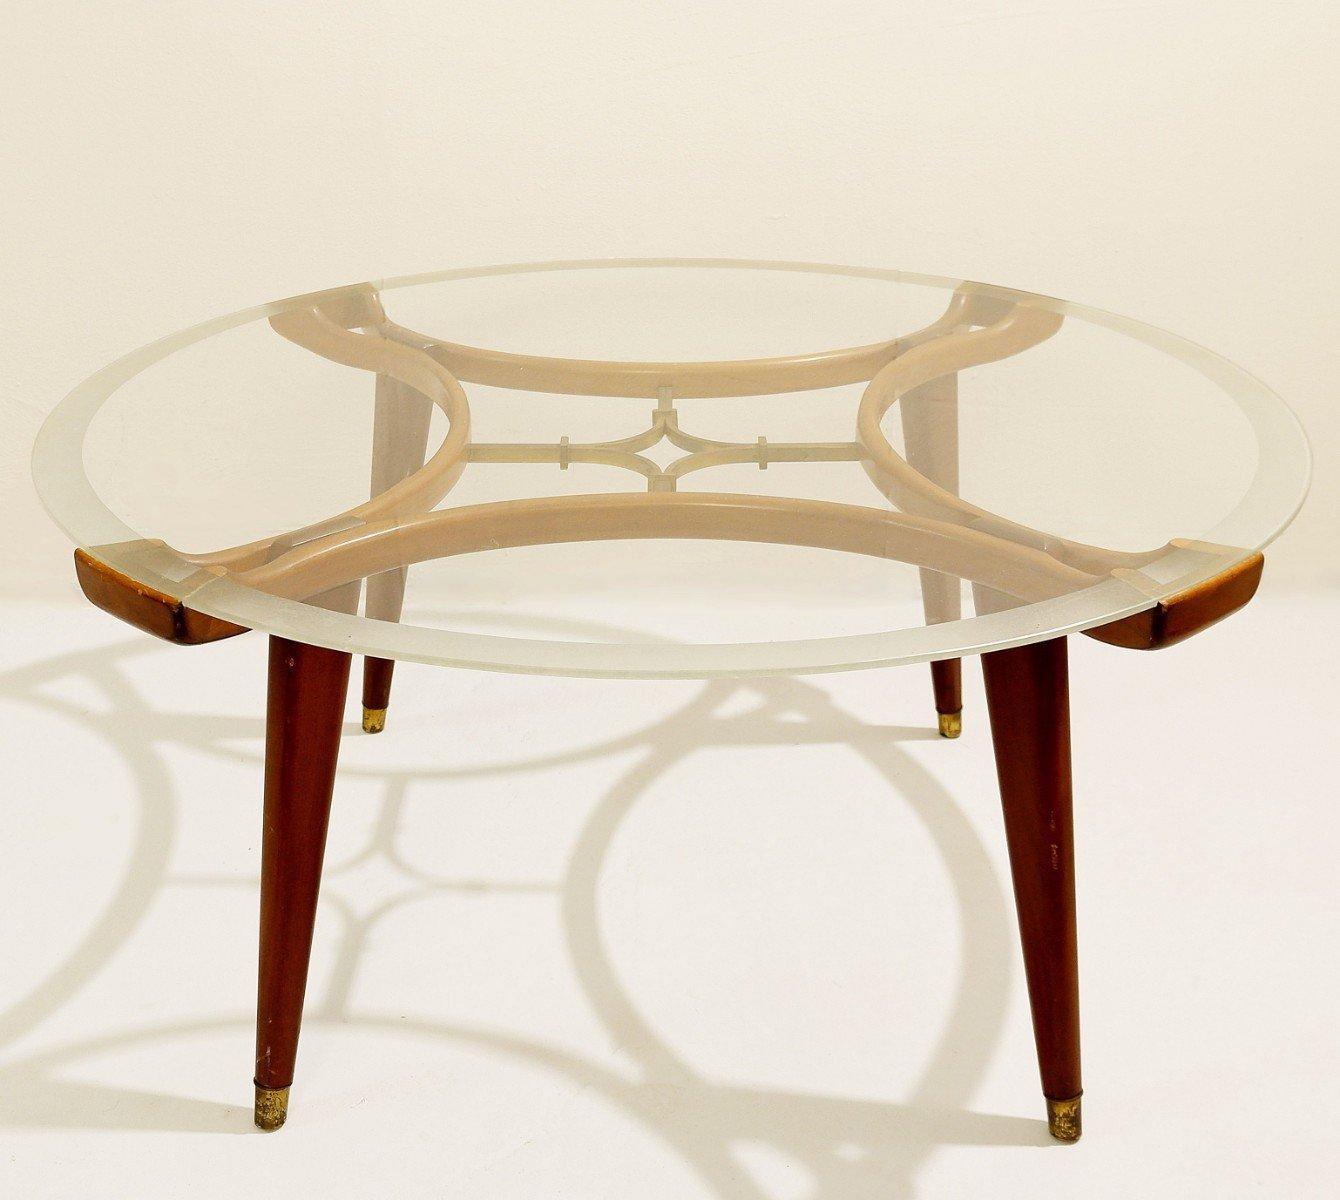 wood brass coffee table with circular glass top